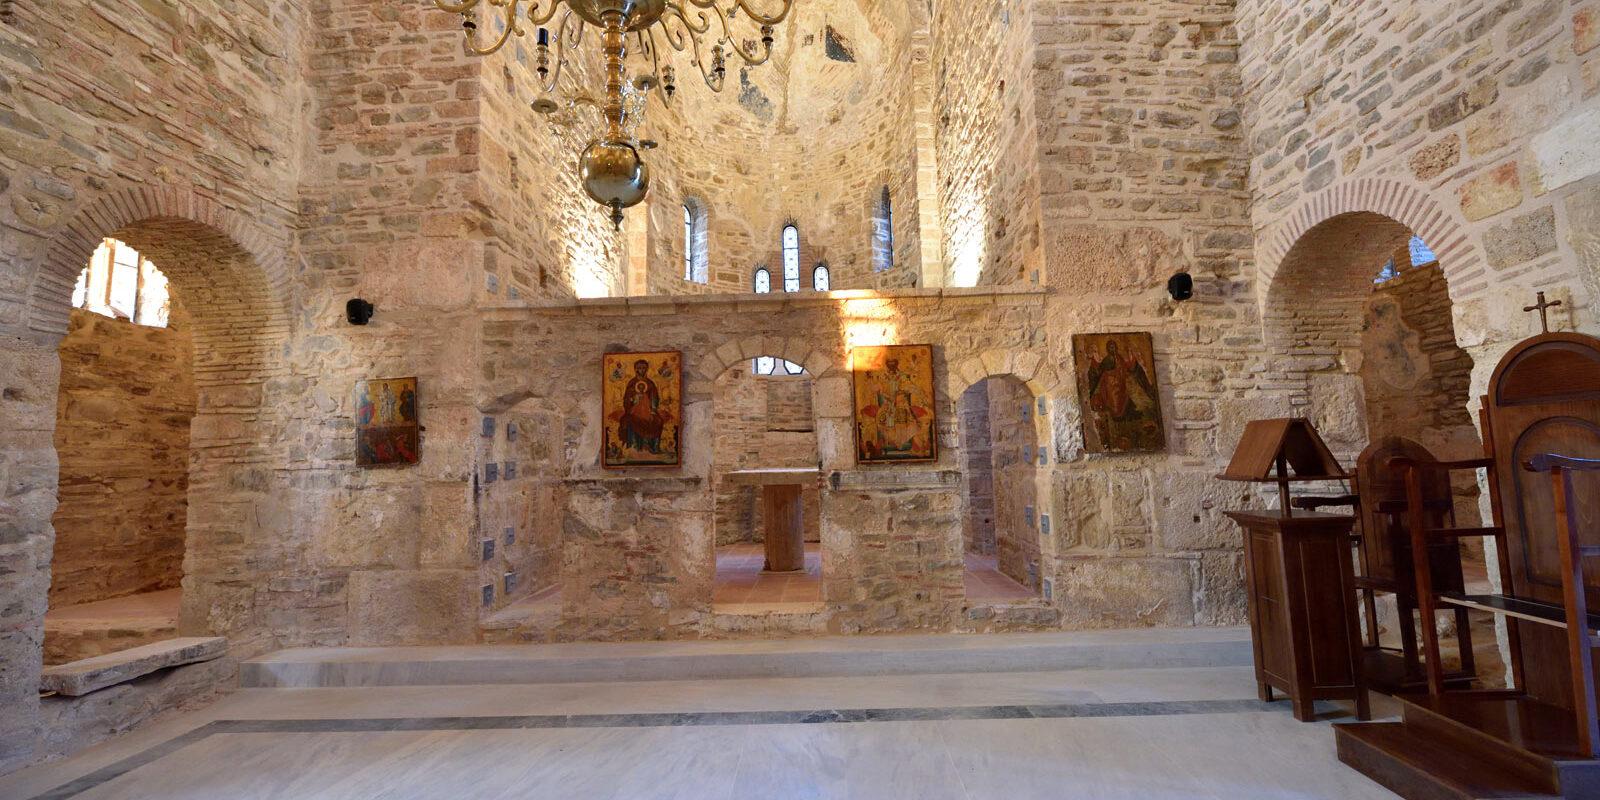 Church of the Transfiguration (20 min)